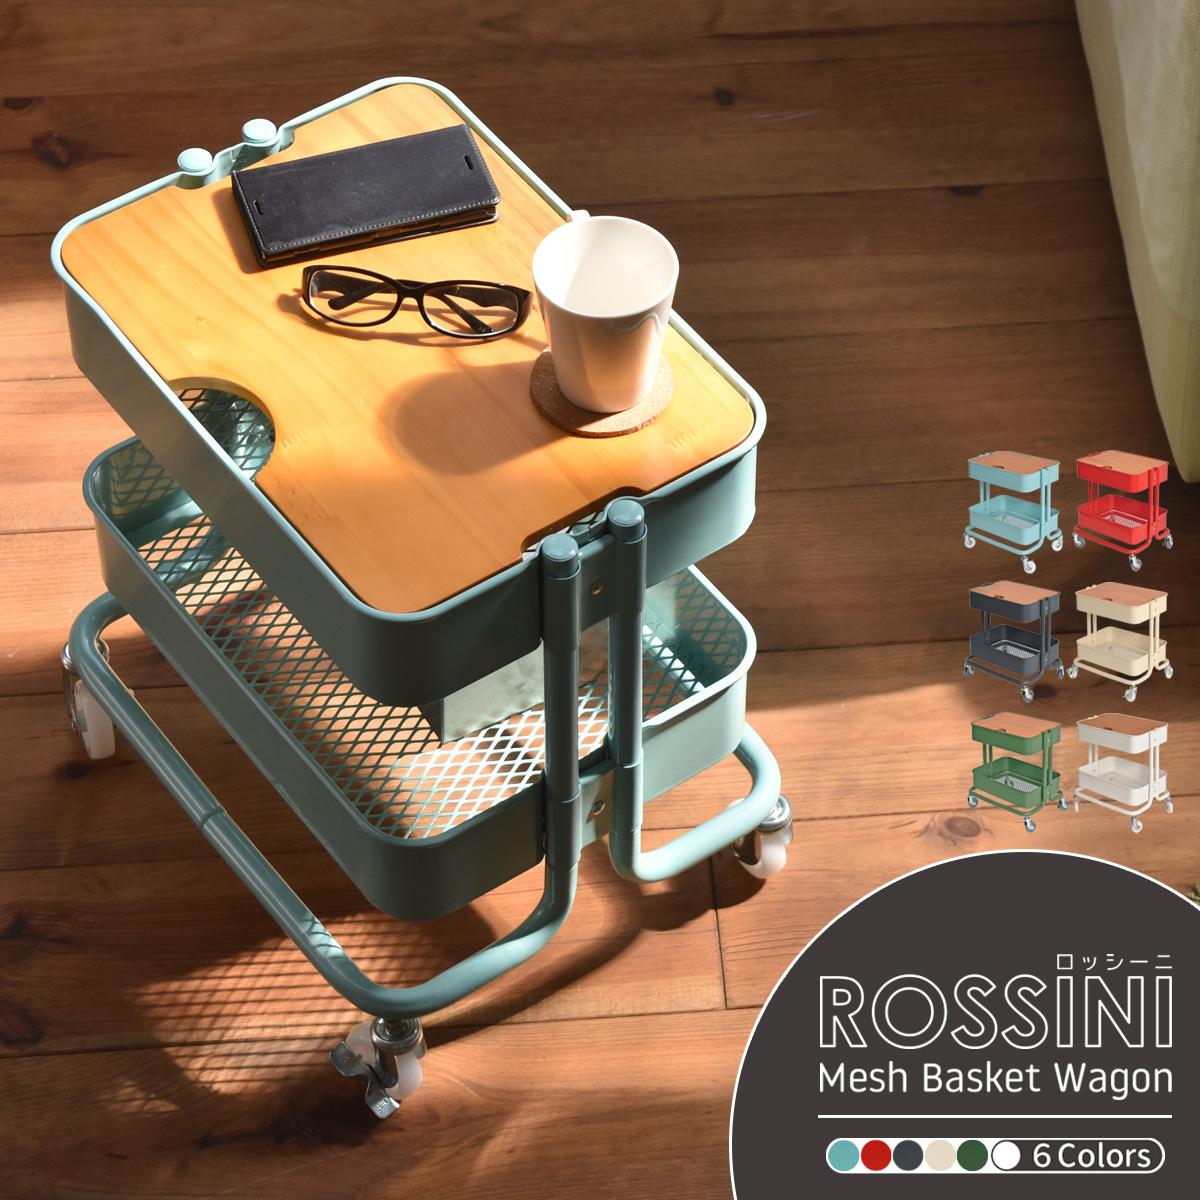 ROSSINI メッシュバスケットワゴン 2段 シンプル